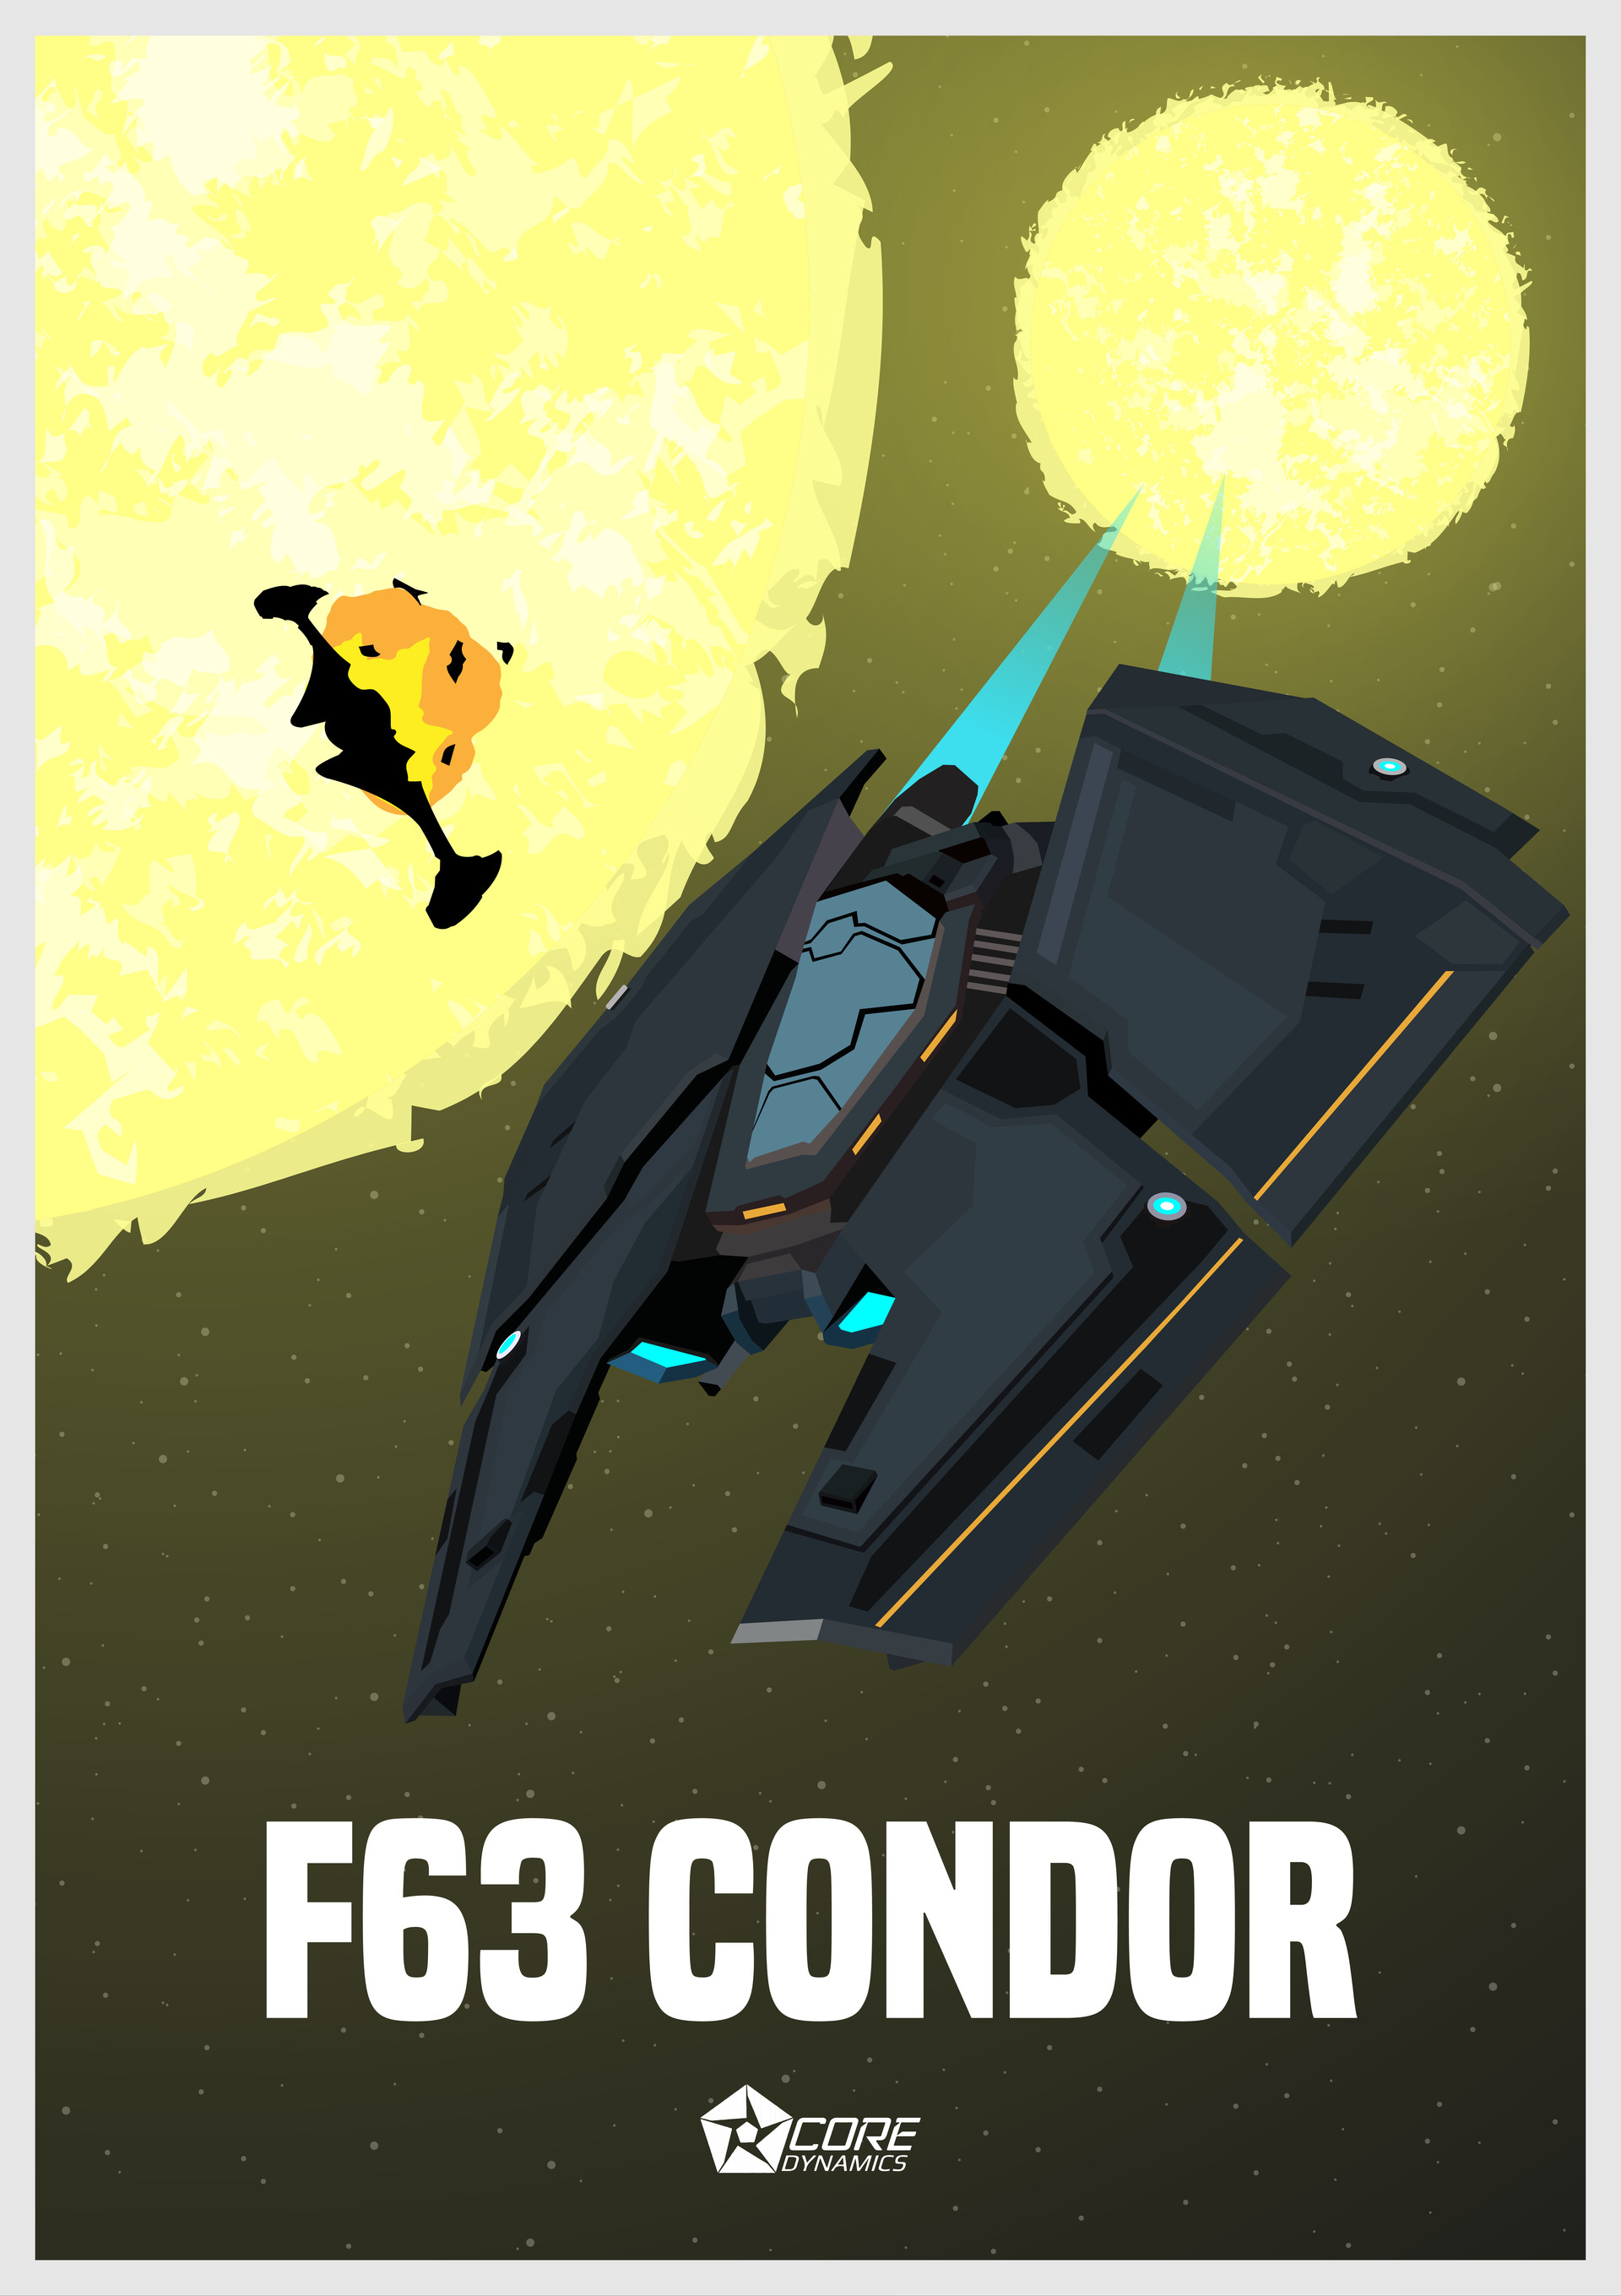 Mathew maddison f 63 condor 01